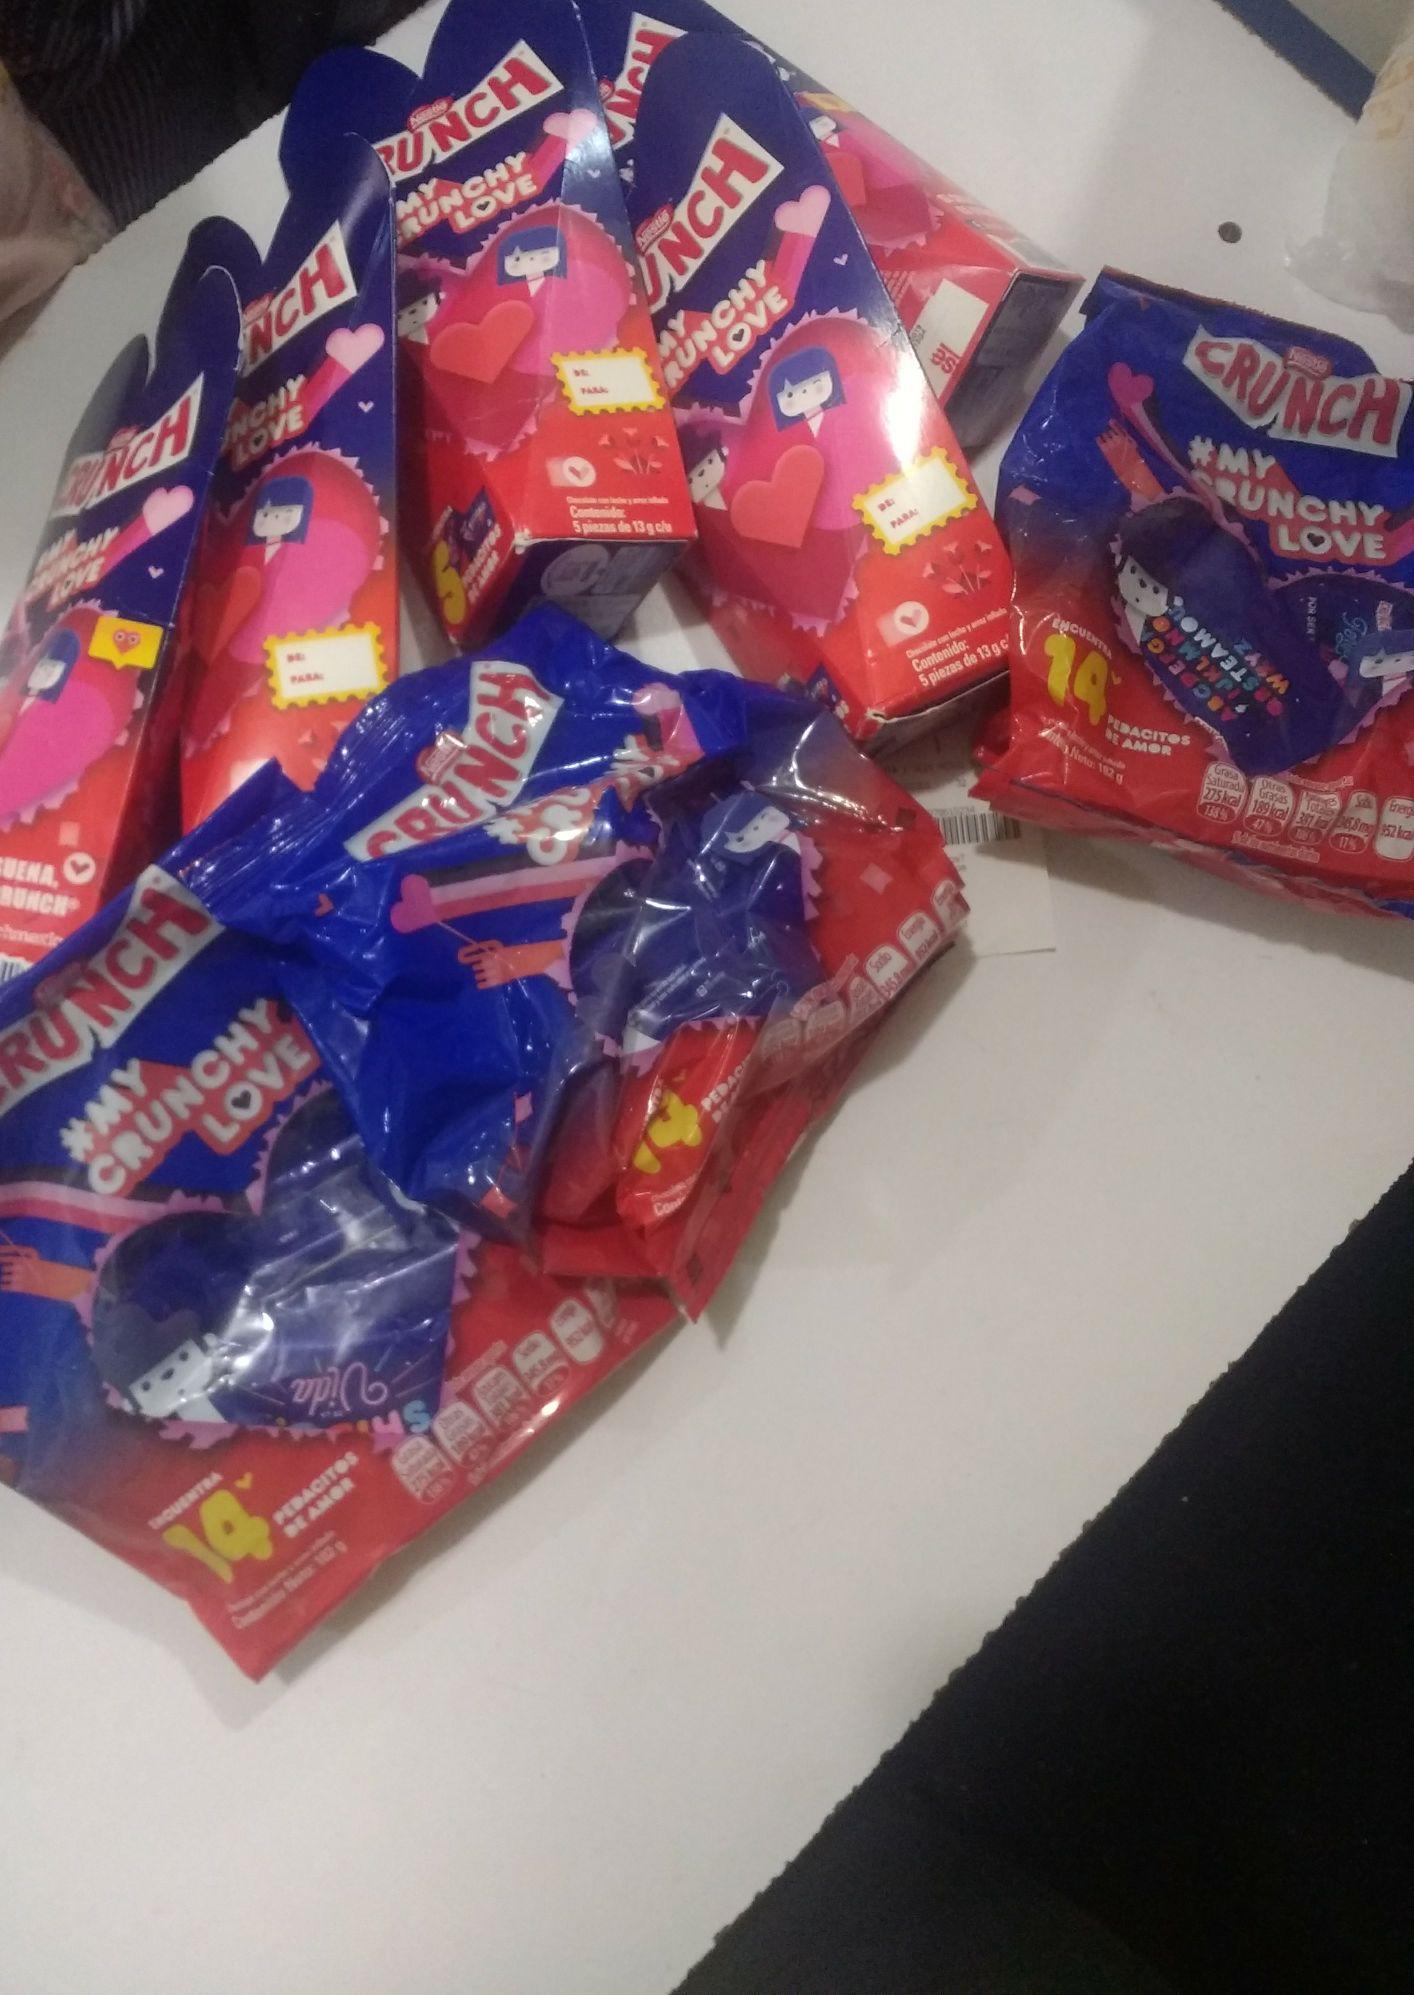 Bodega Aurrera: Chocolates Crunch